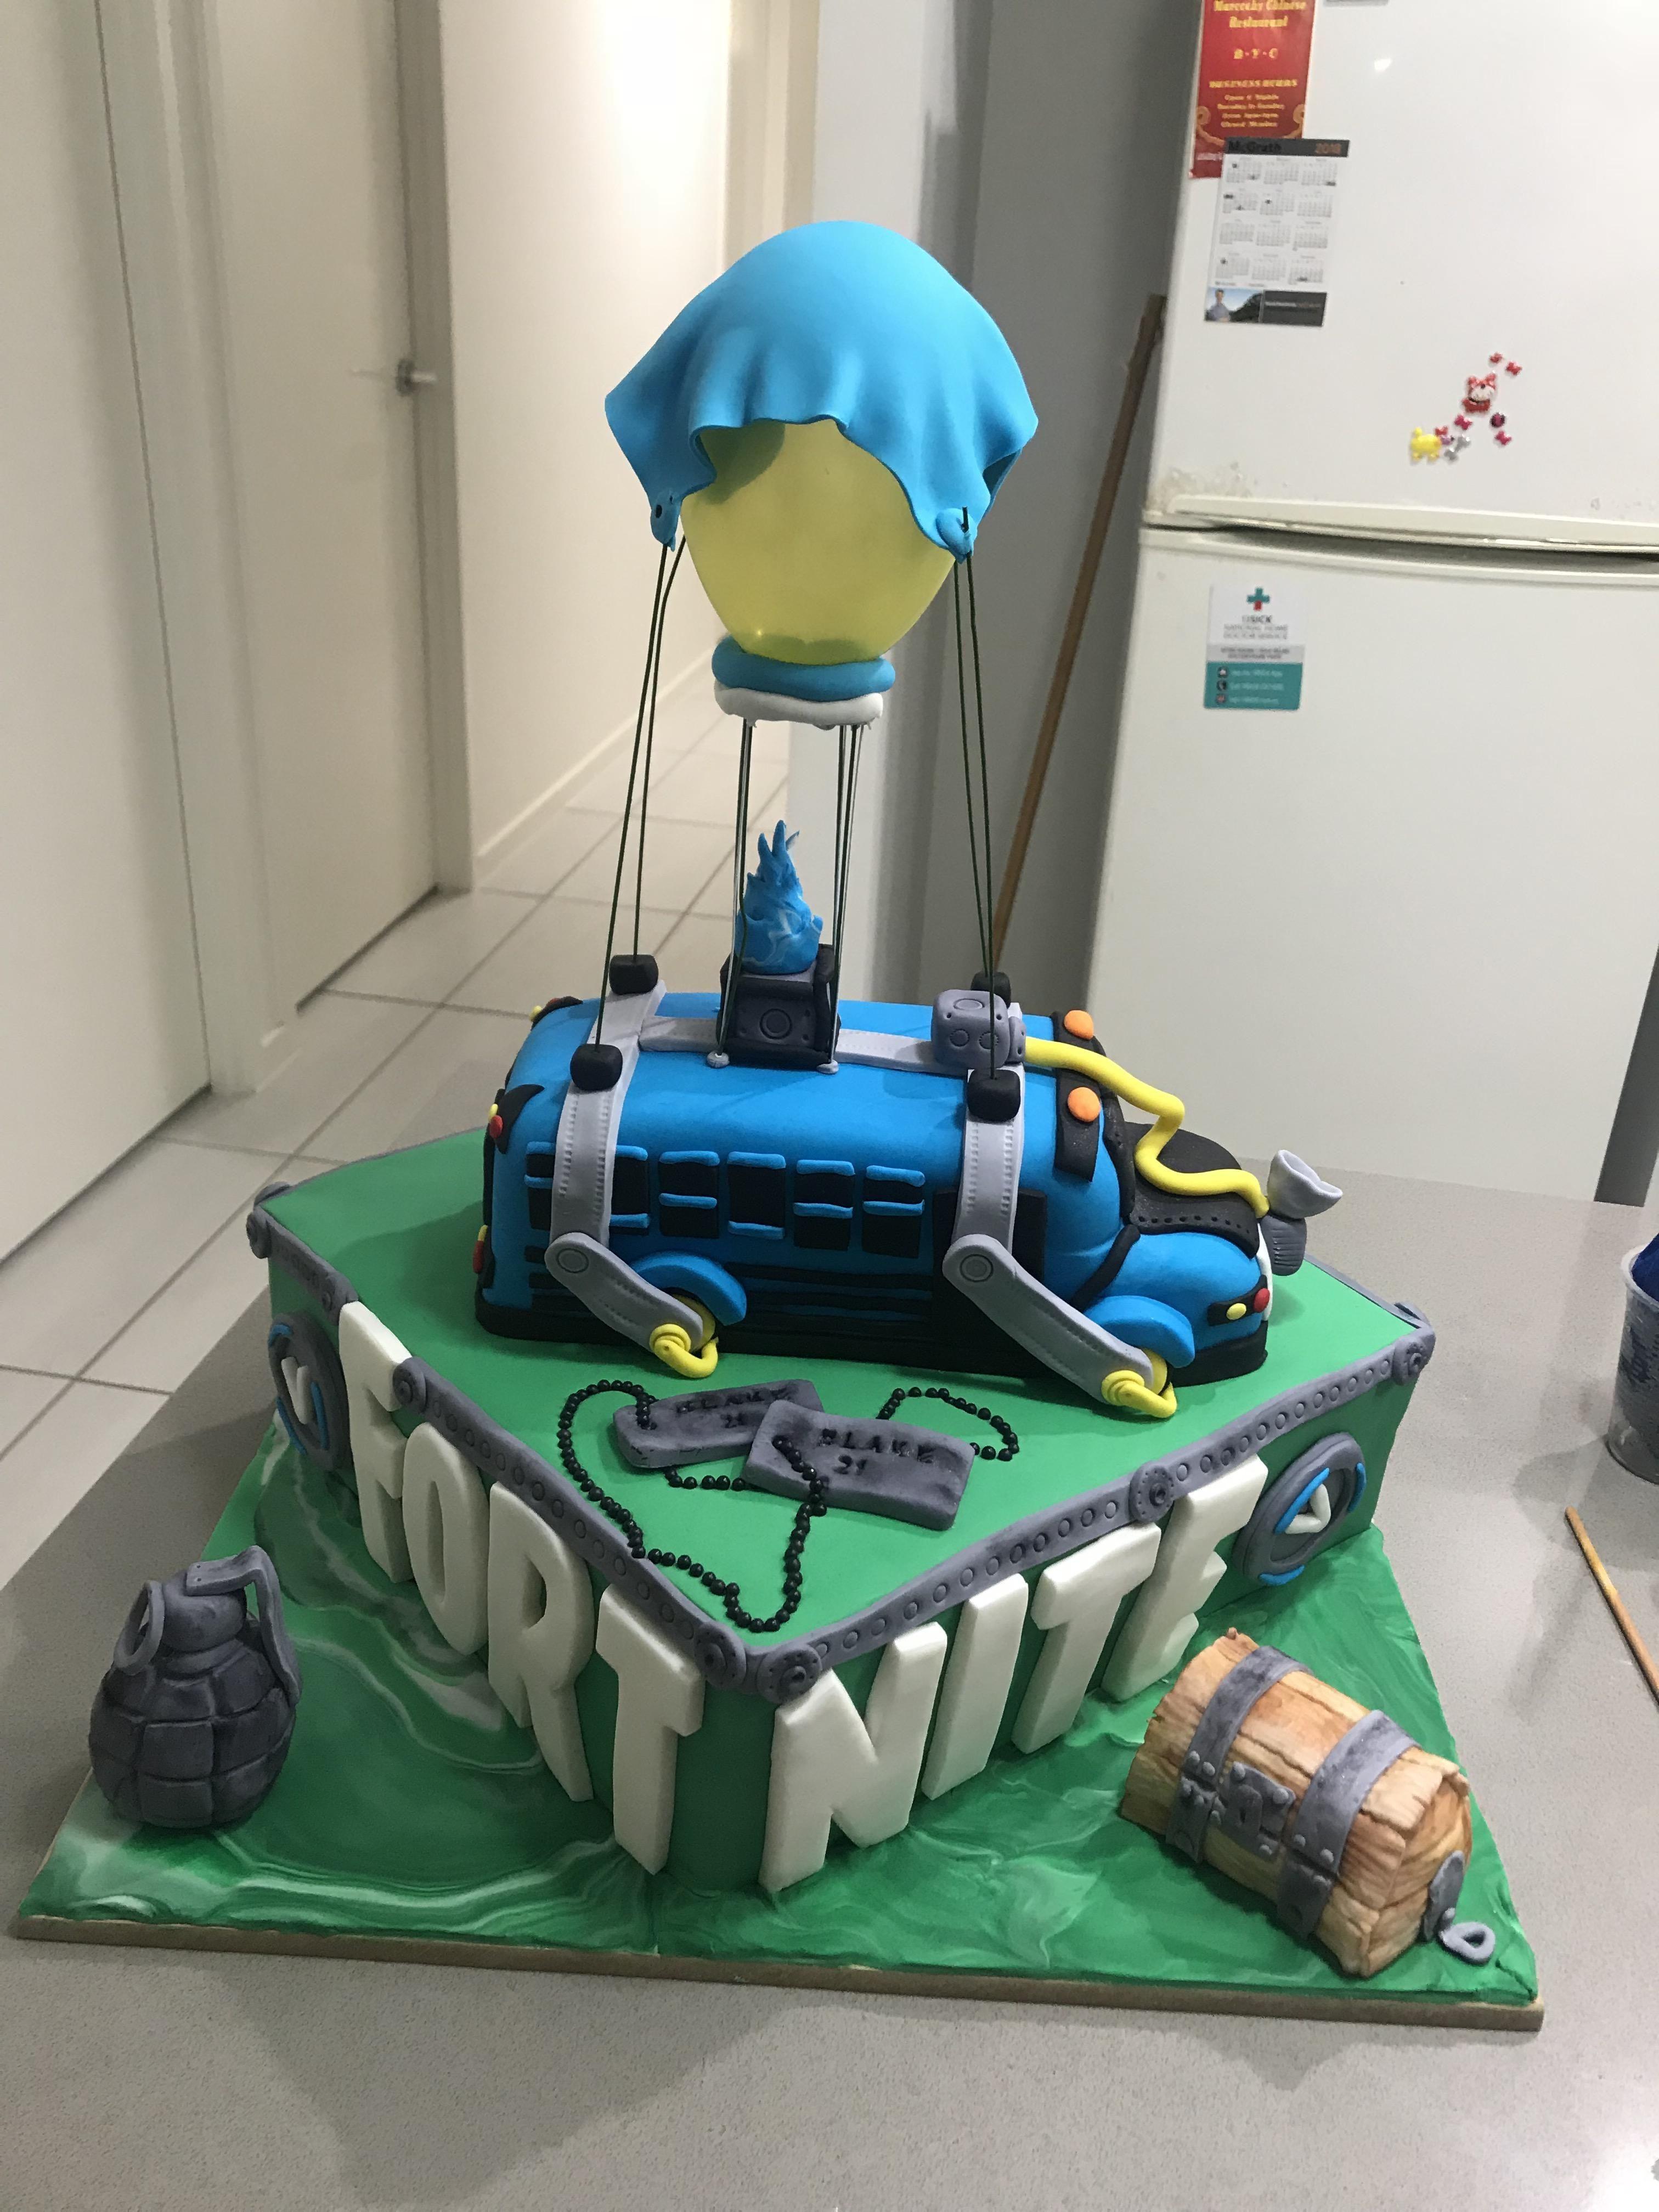 Top 10 wedding decorations november 2018 Fortnite birthday cake  Bubba in   Pinterest  Birthday